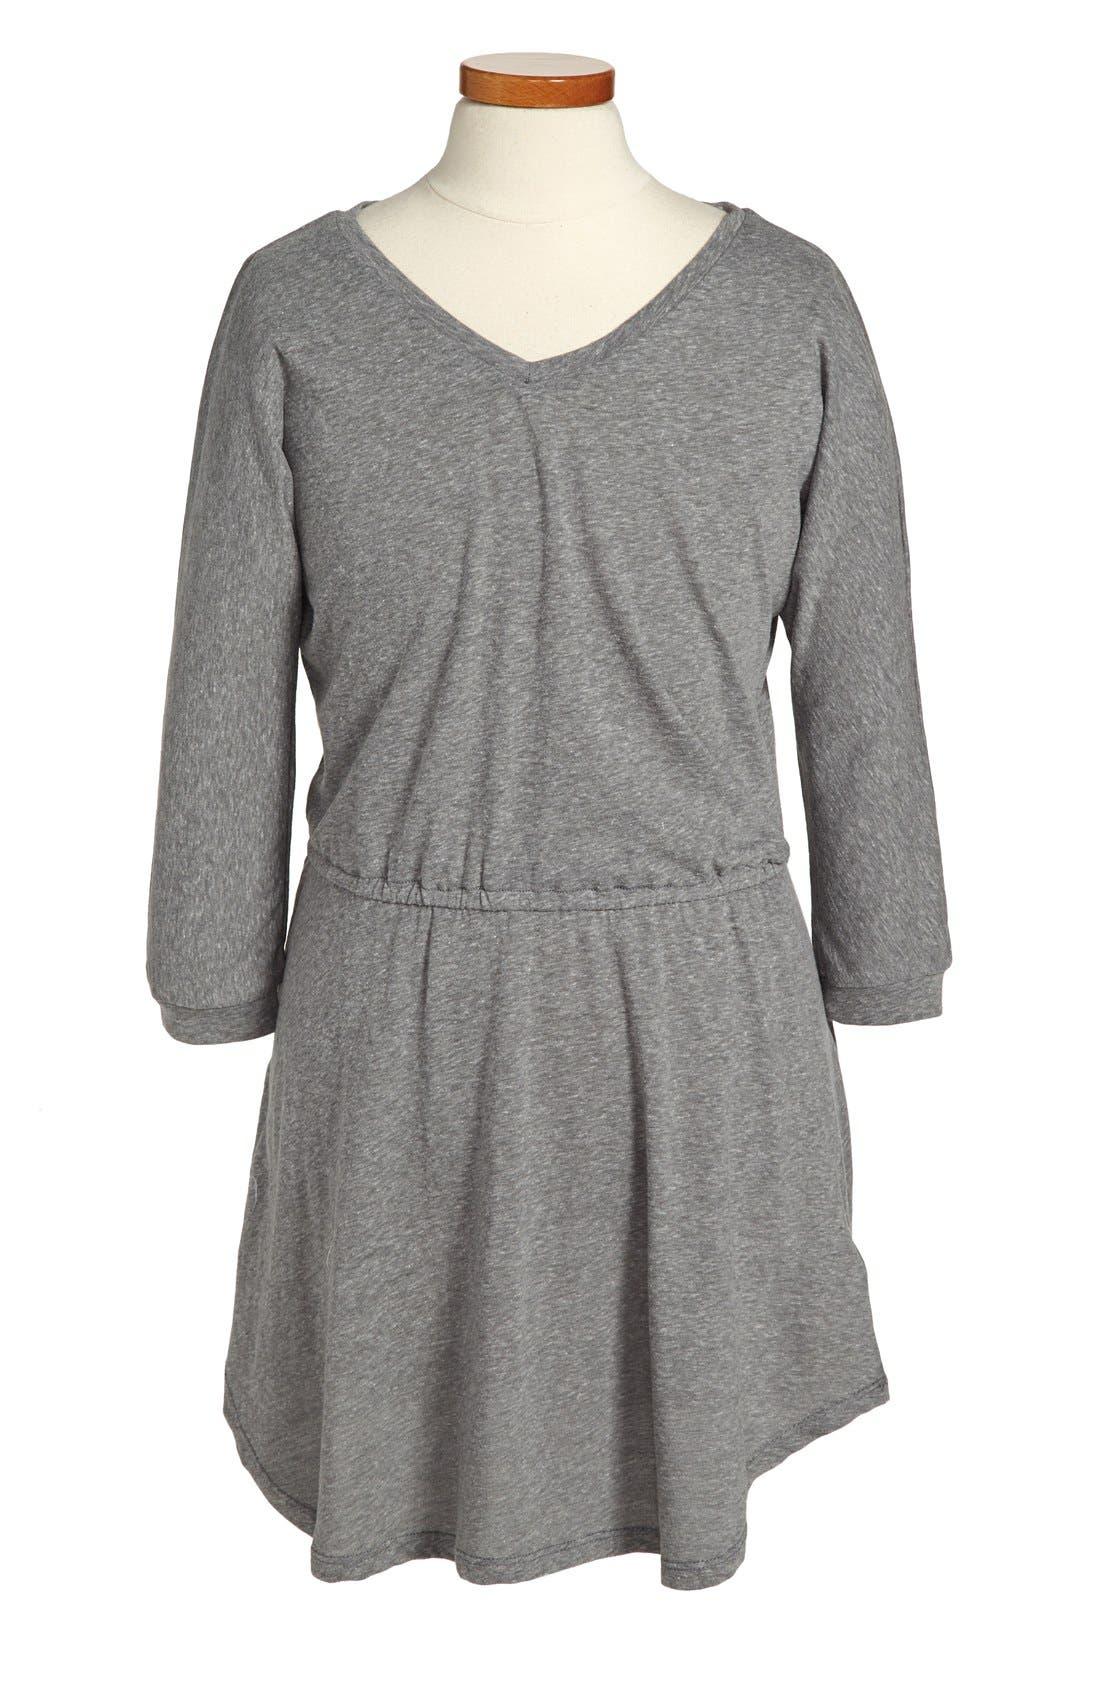 Alternate Image 1 Selected - Splendid Ruffle Dress (Big Girls)